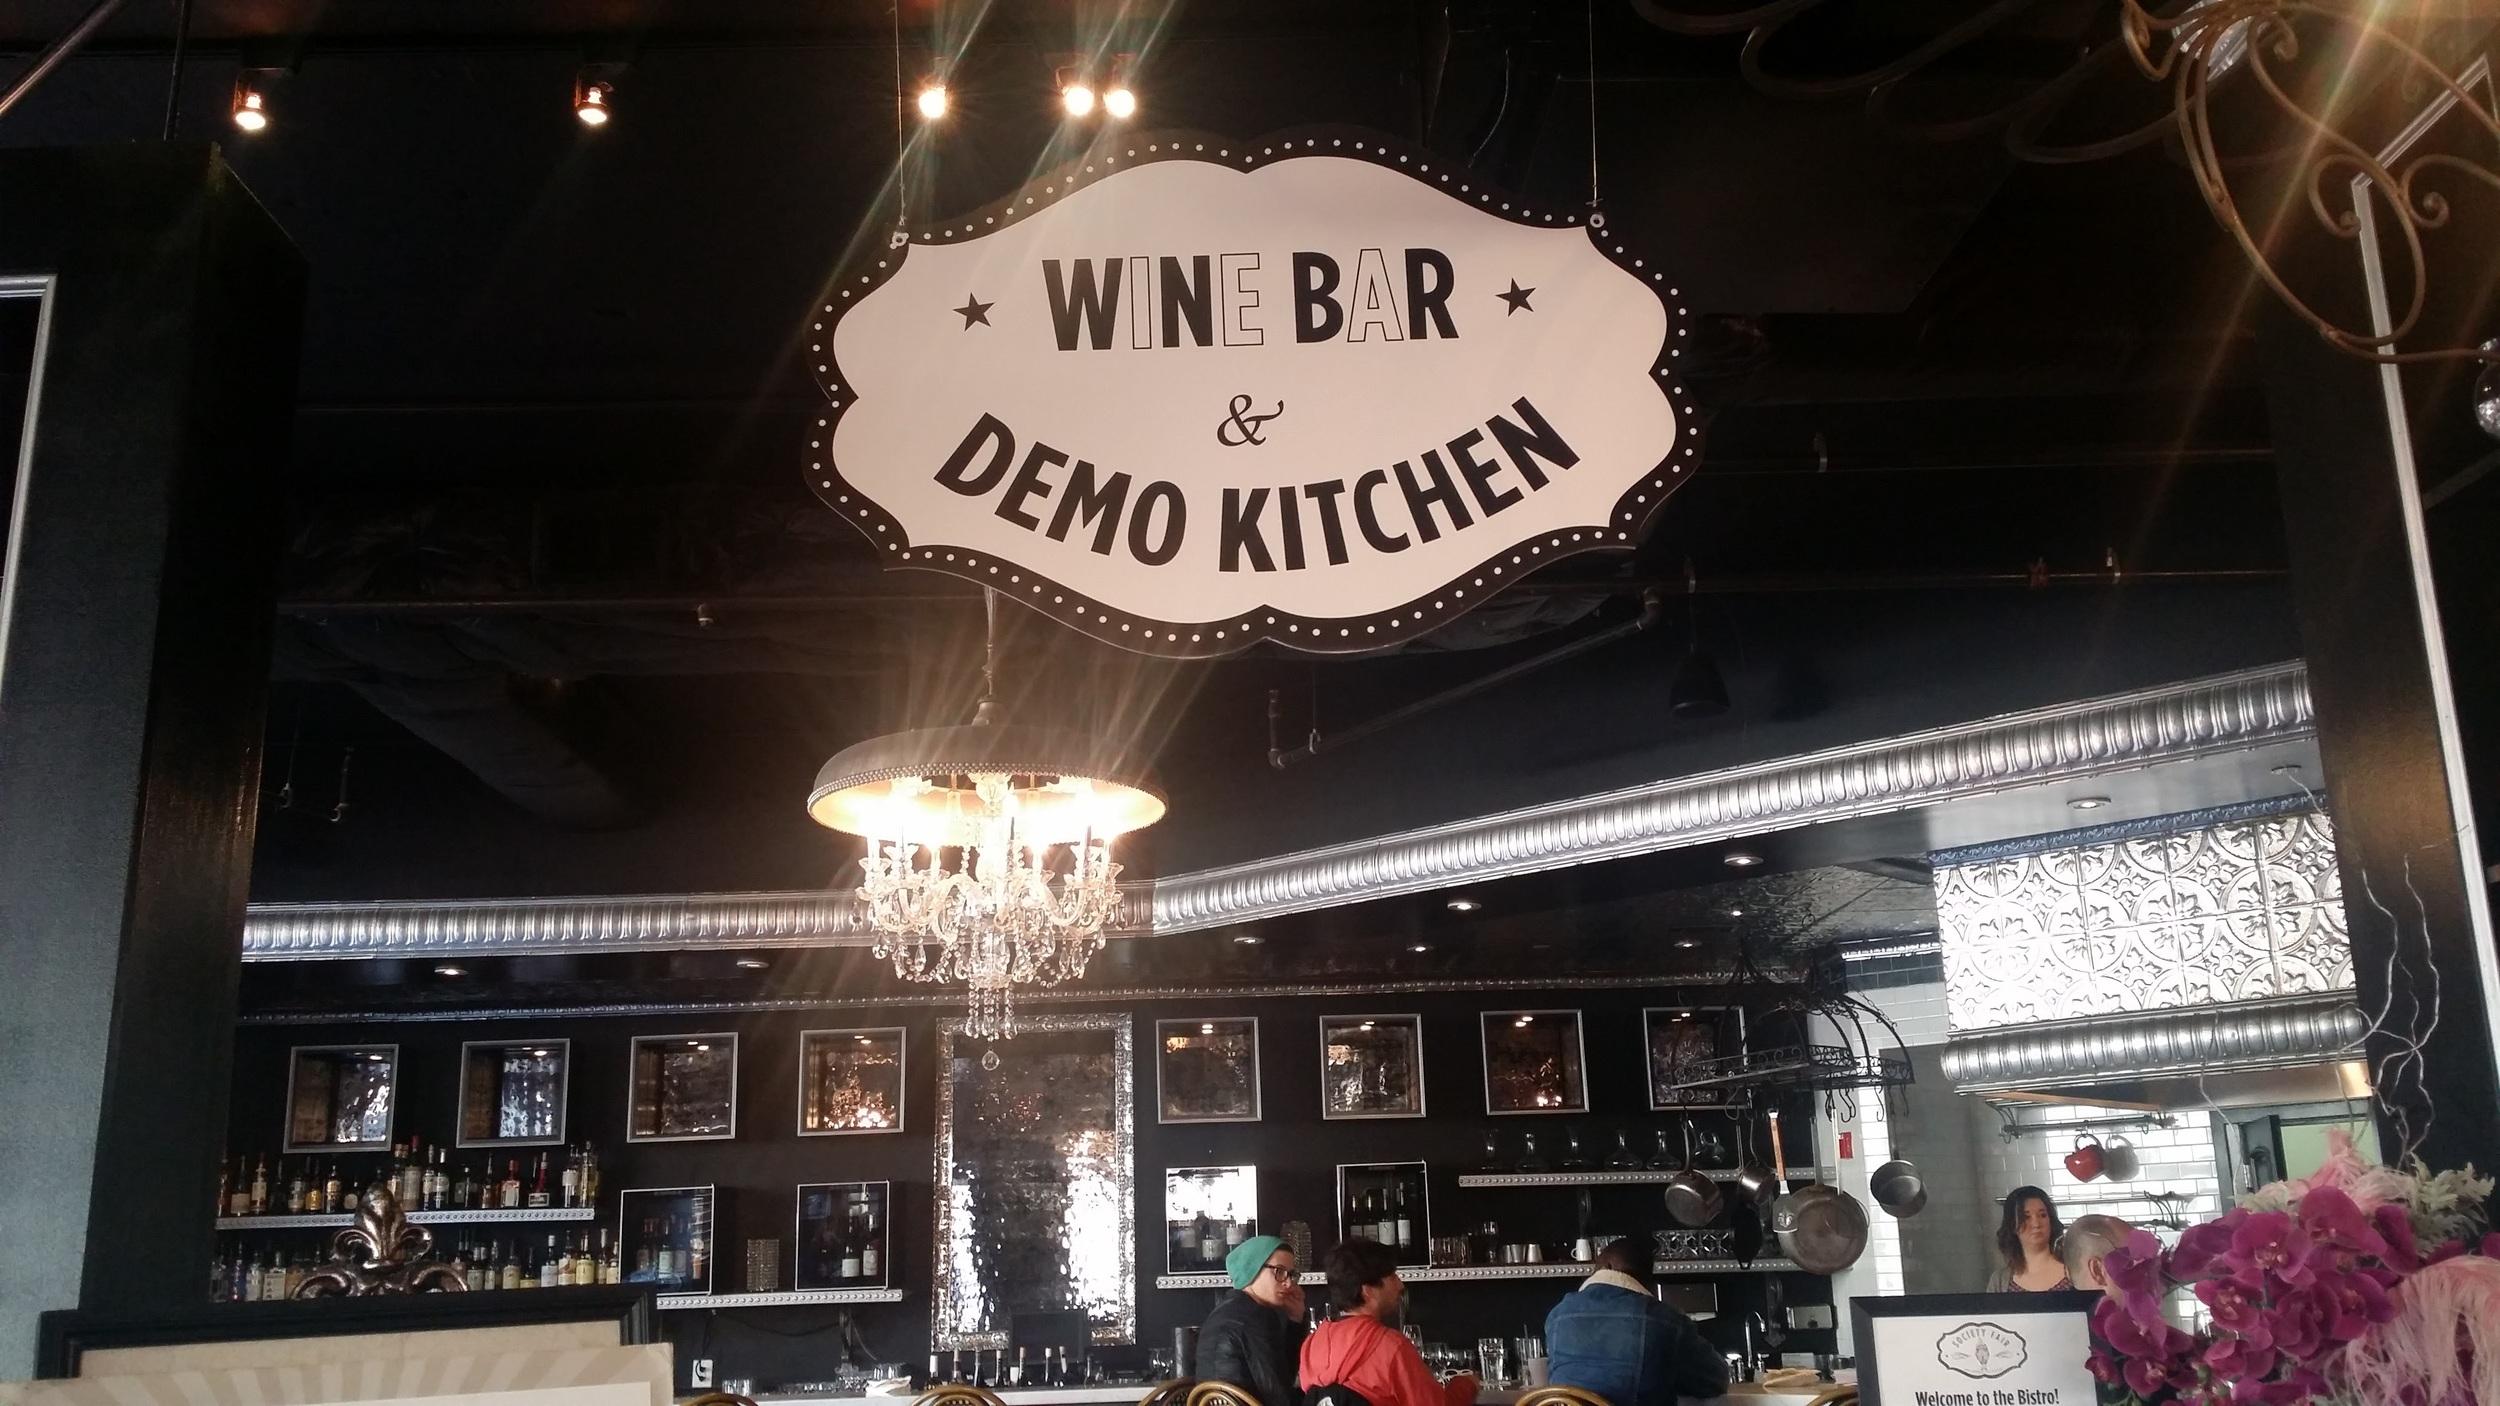 Society Fair's Wine Bar and Demo Kitchen